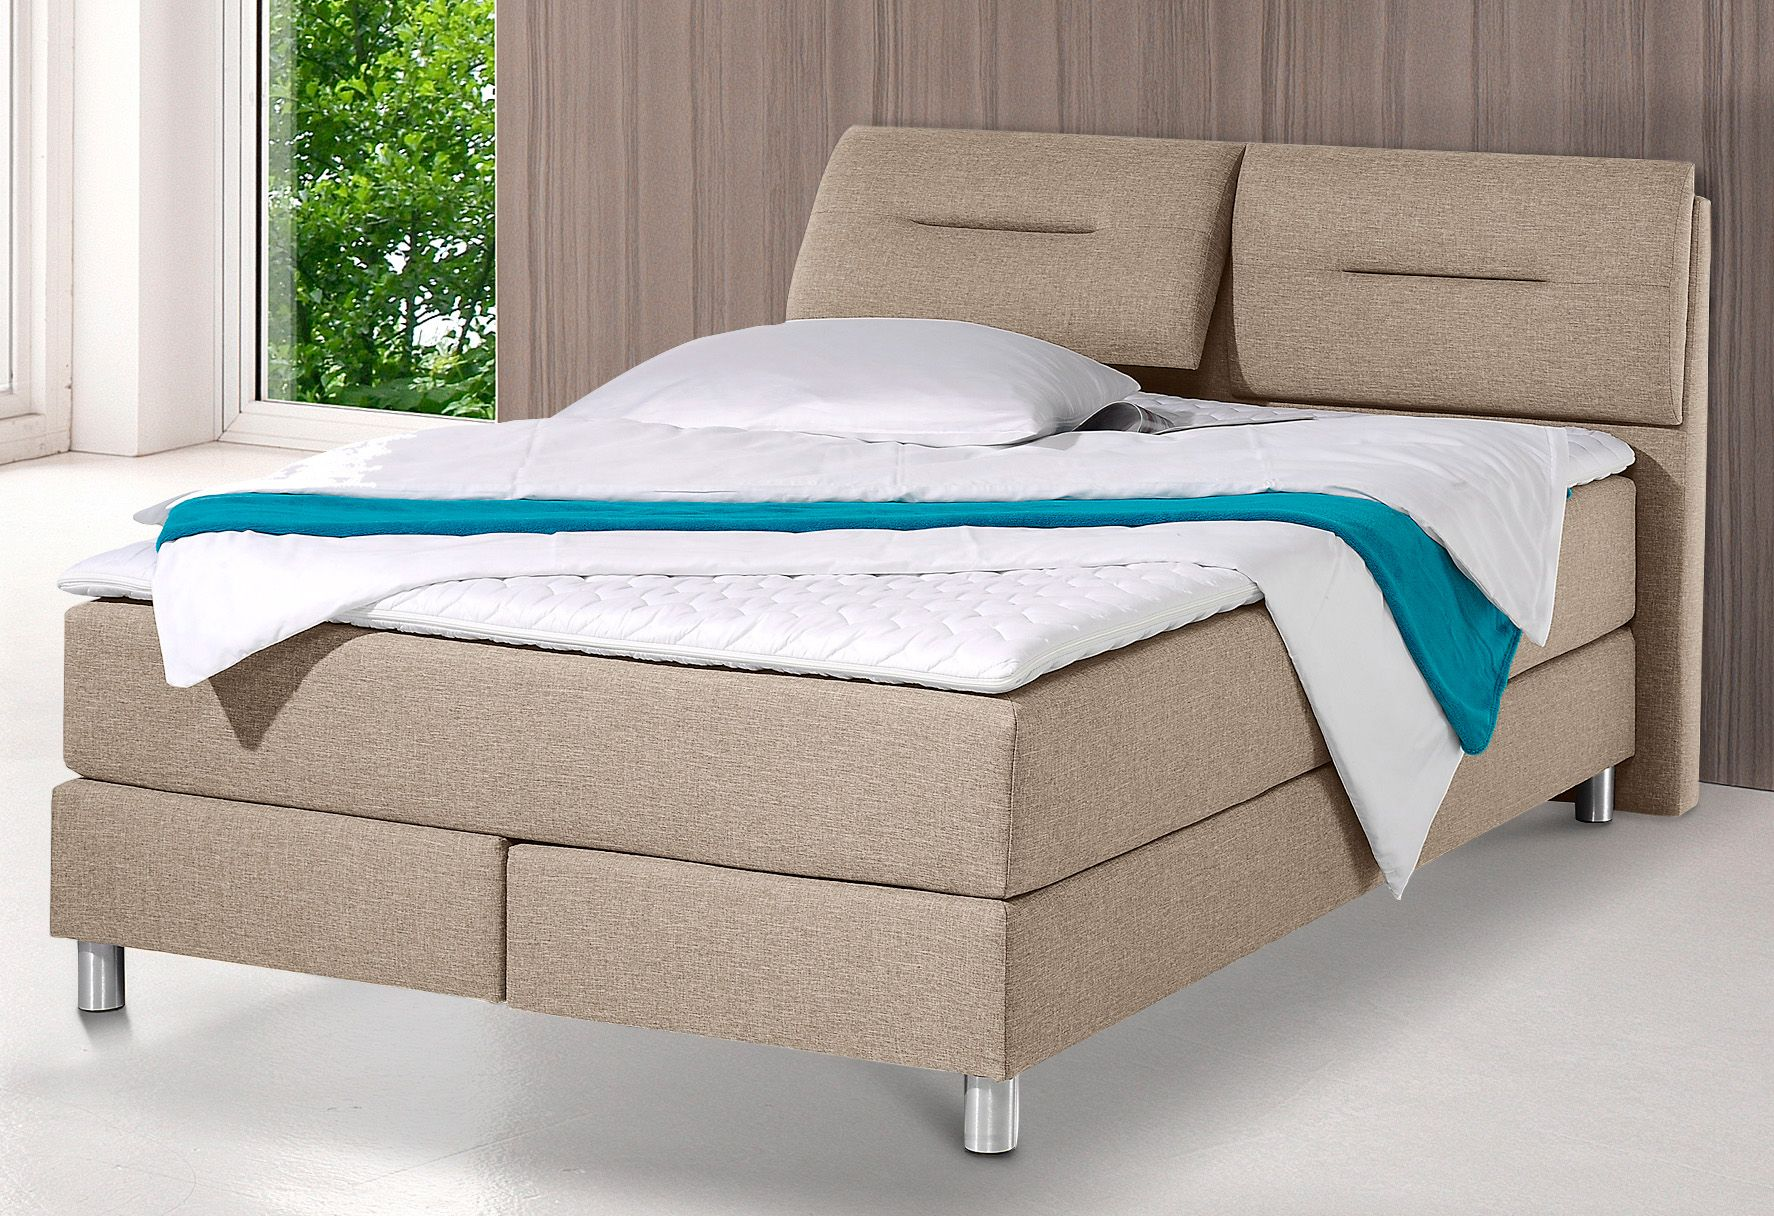 maintal boxspringbett inkl topper schwab versand home affaire. Black Bedroom Furniture Sets. Home Design Ideas